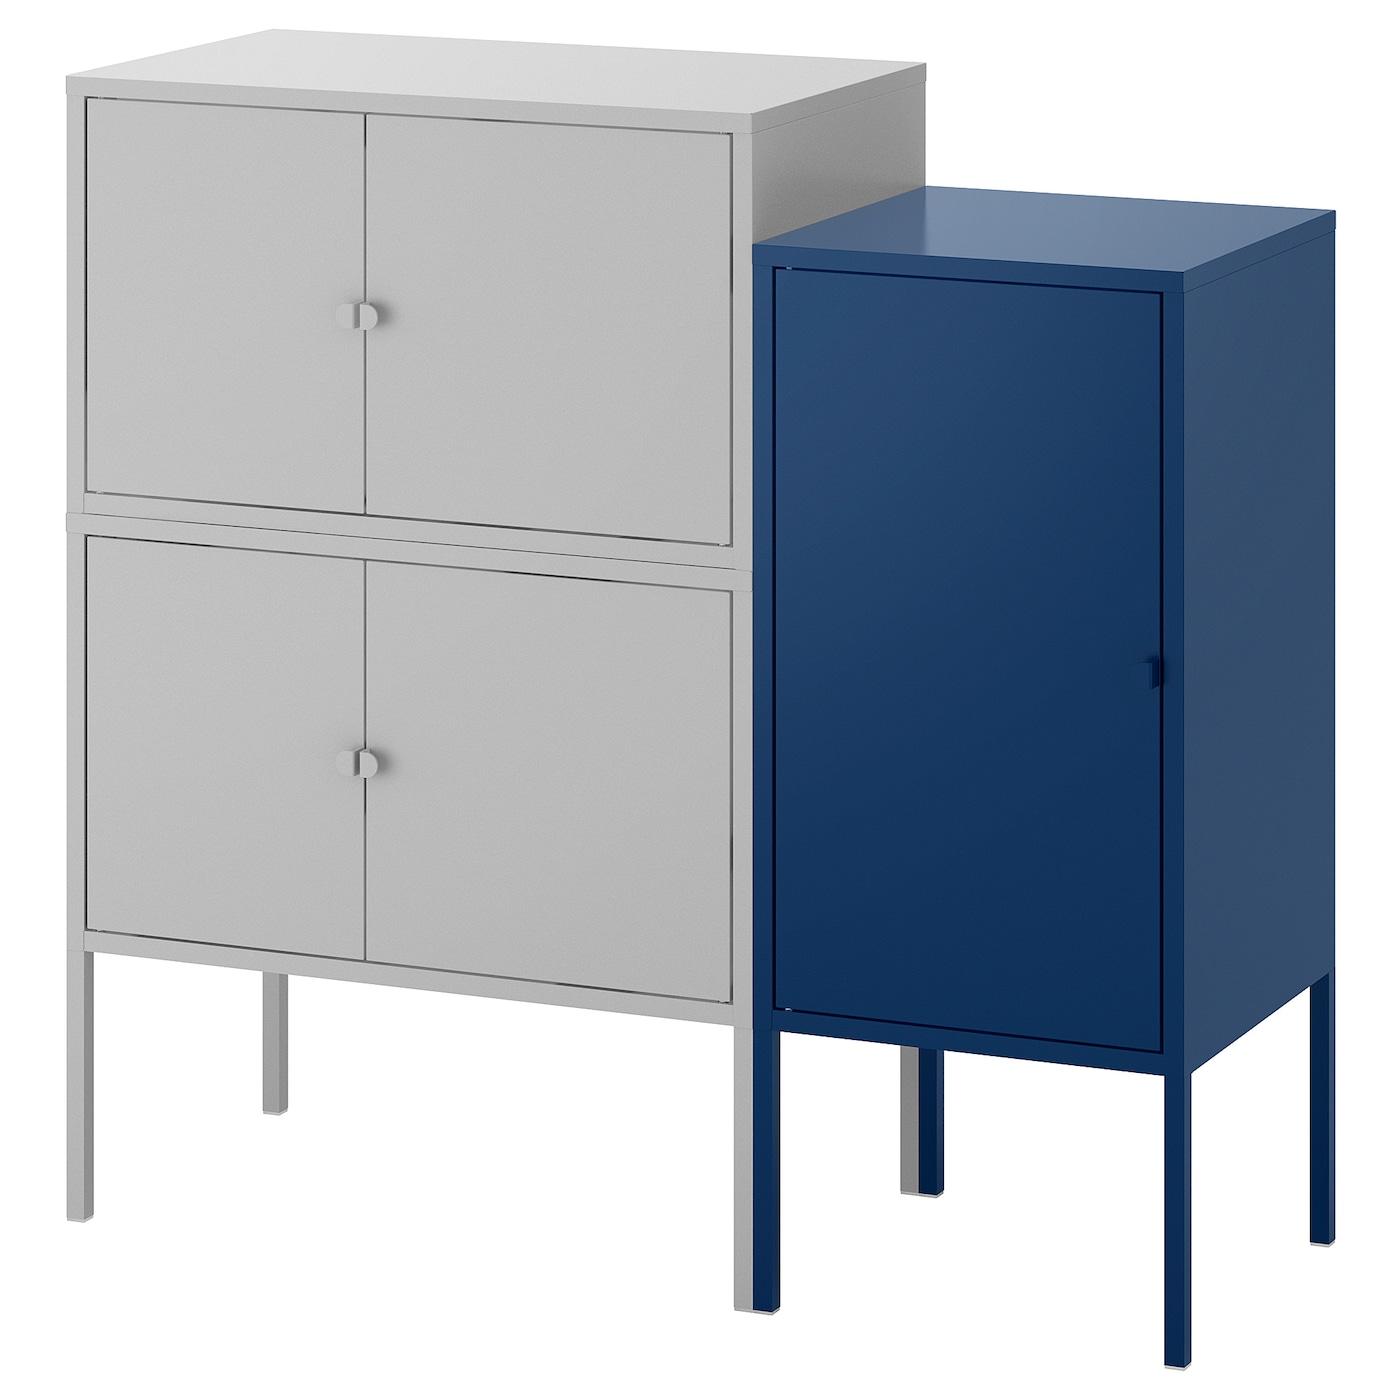 Lixhult Cabinet: LIXHULT Cabinet Combination Grey/dark Blue 95 X 35 X 92 Cm